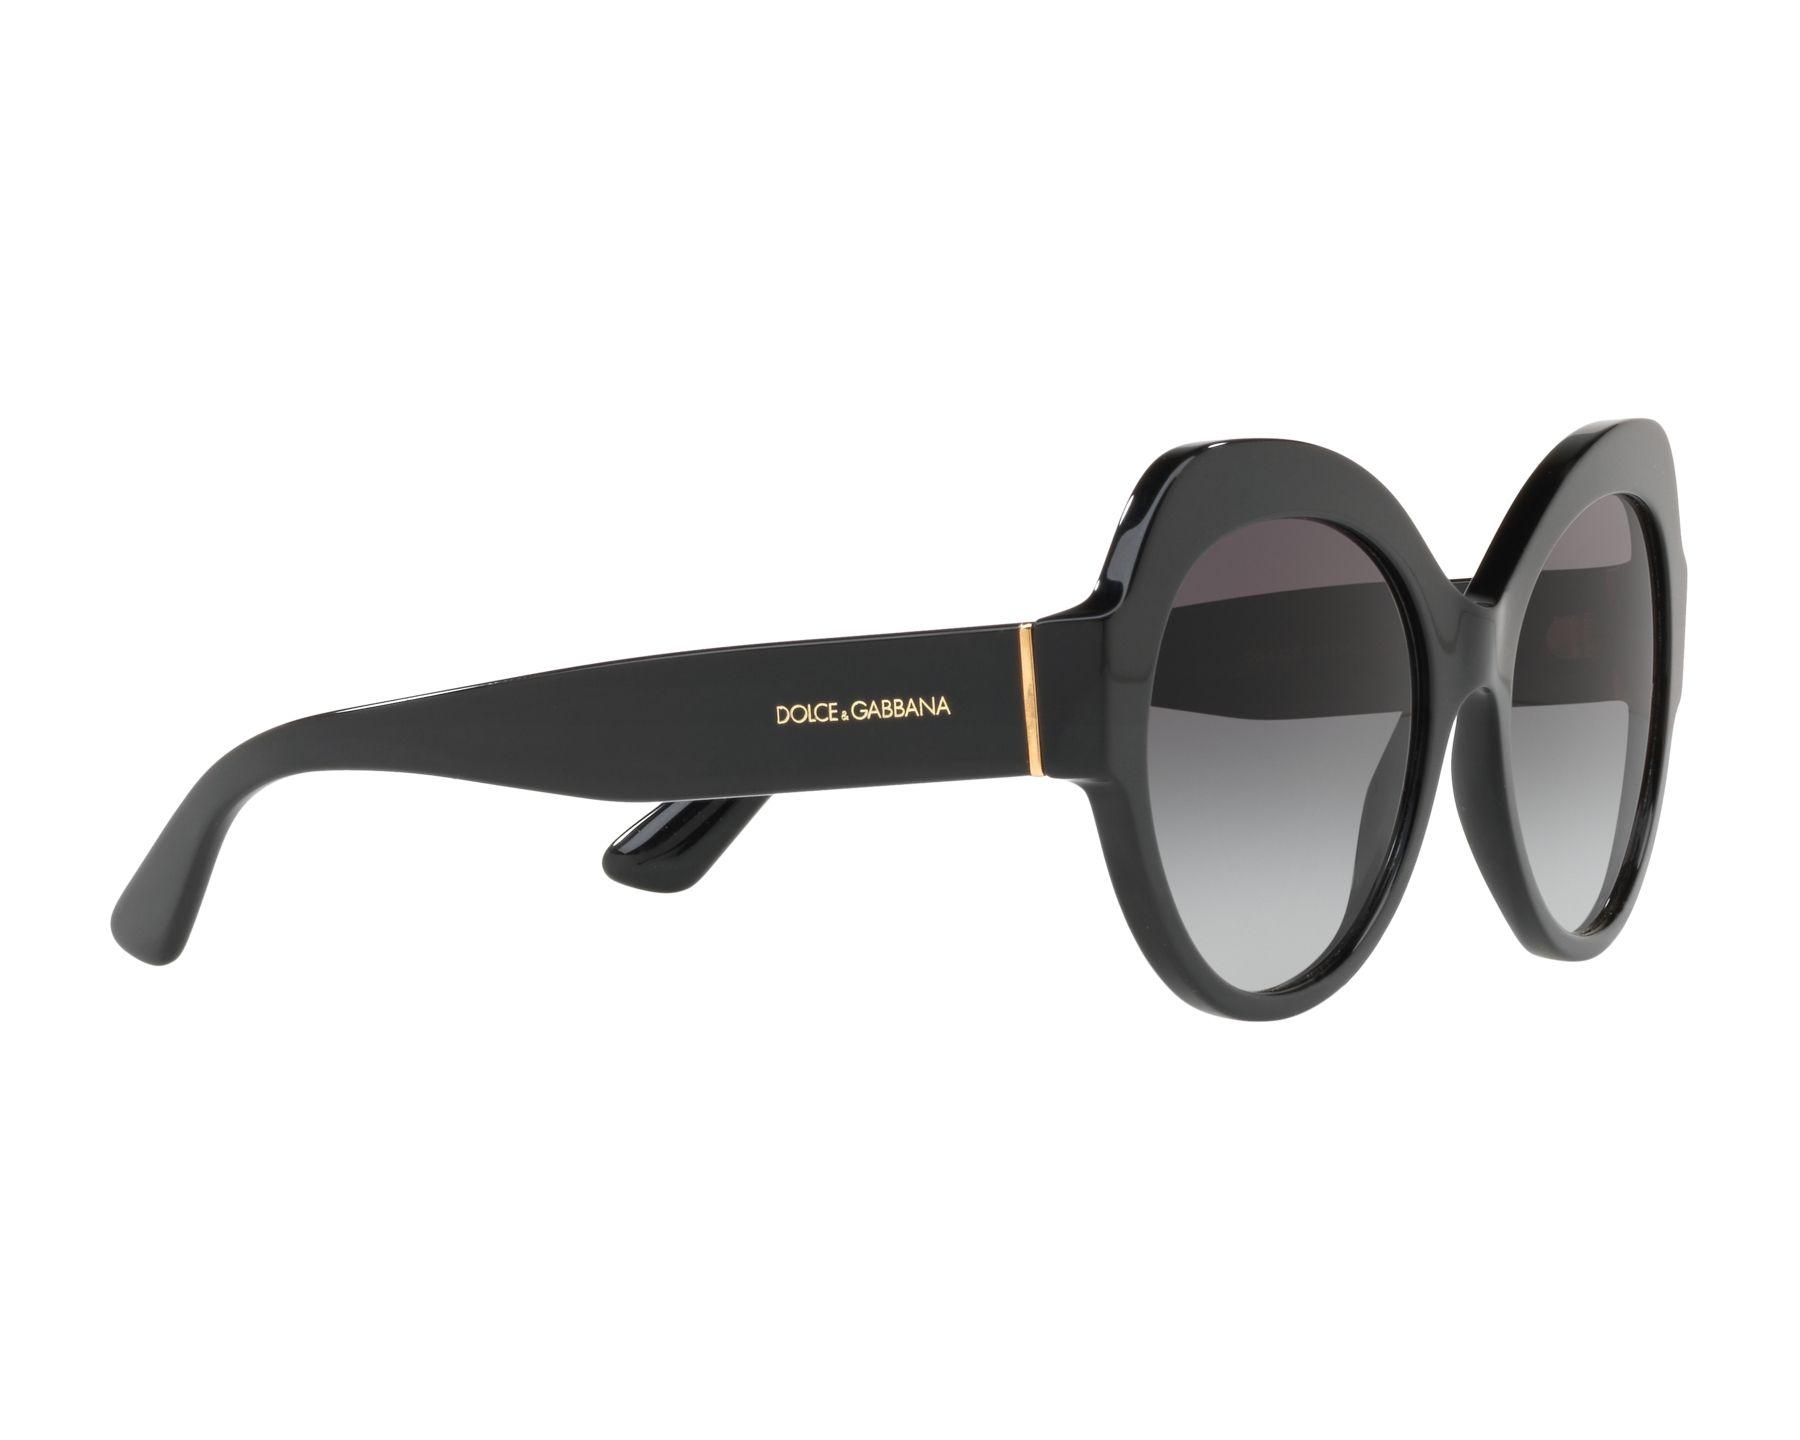 Dolce & Gabbana DG4320 501/8G 56-19 YLxIOTb